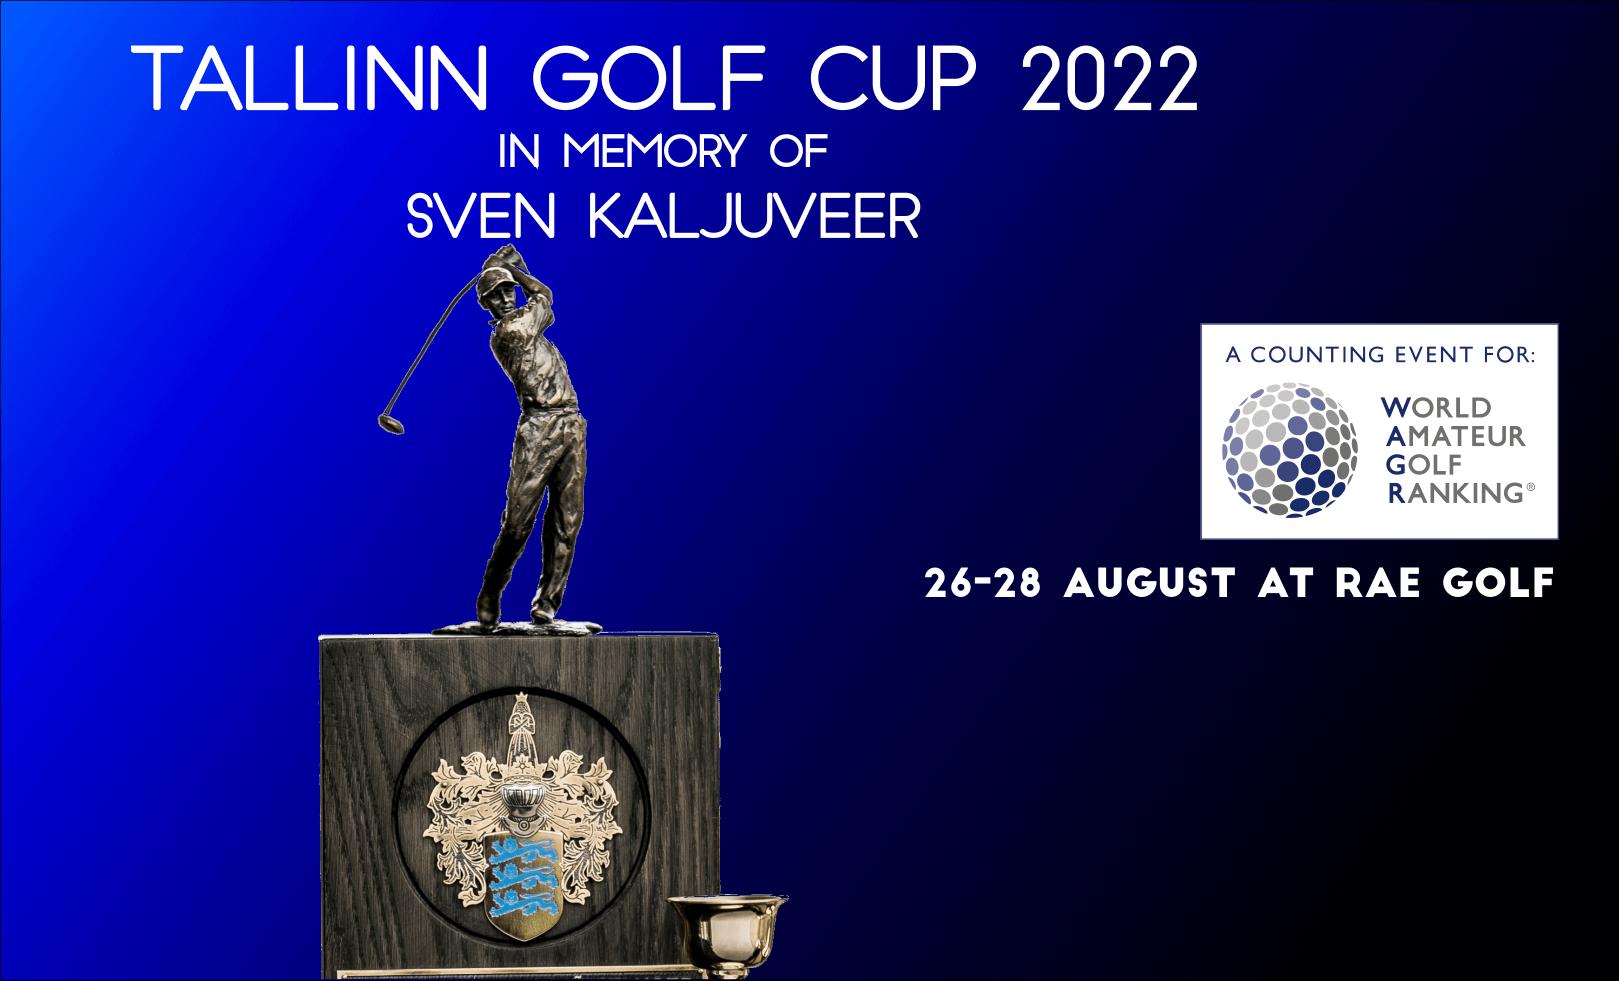 Tallinn Golf Cup by Sven Kaljuveer